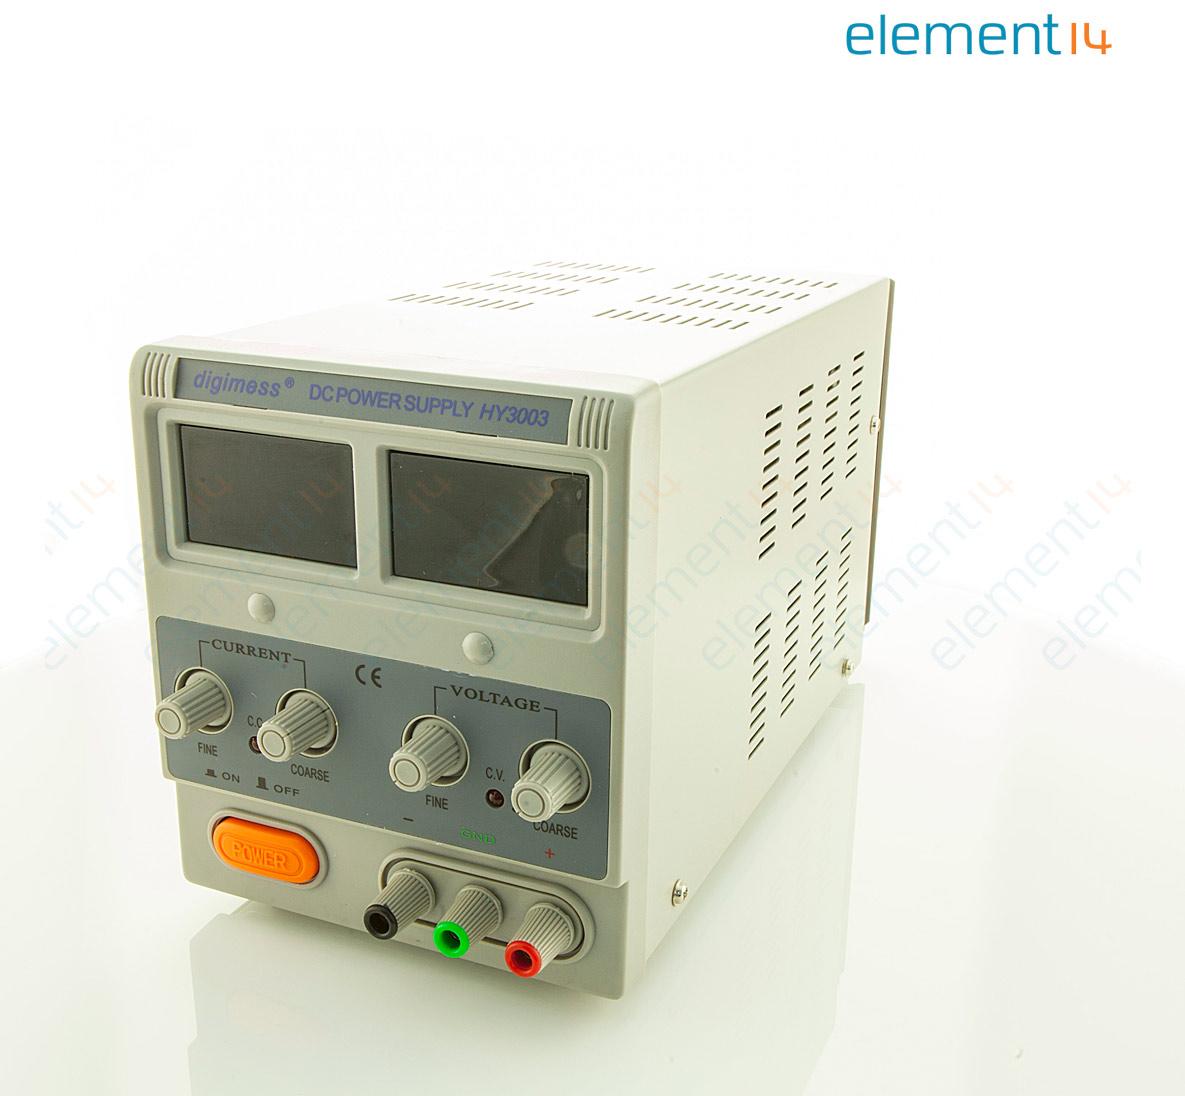 Hy3003 Digimess Bench Power Supply Adjustable 1 Output 0 30v0 2a Voltage And Current Regulator V 30 A 3